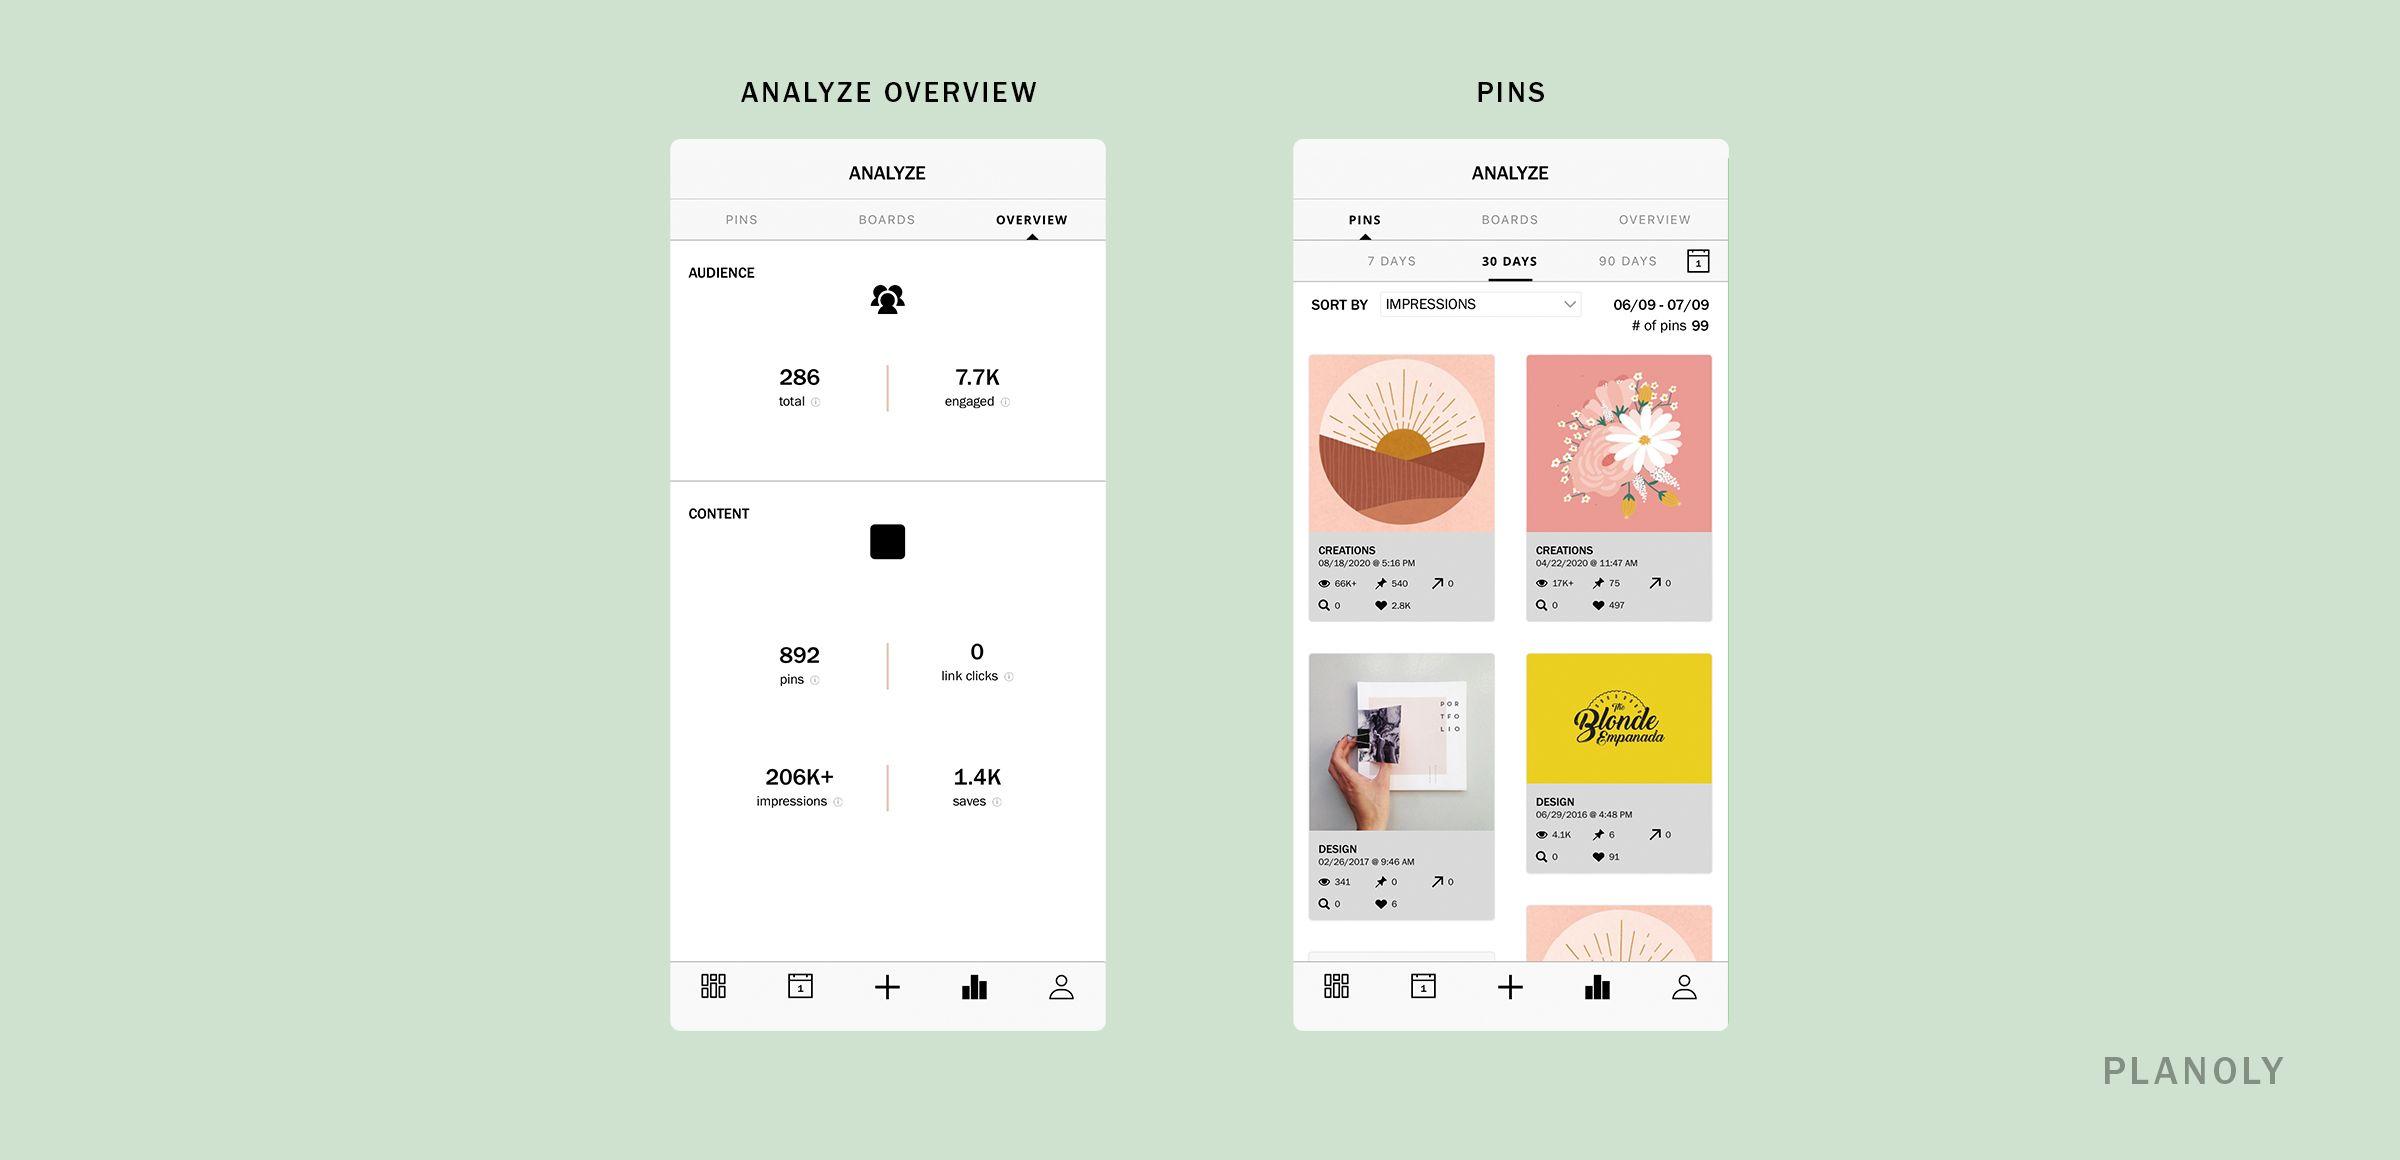 PLANOLY - Blog Post - Pinterest for Business - Image 5-2